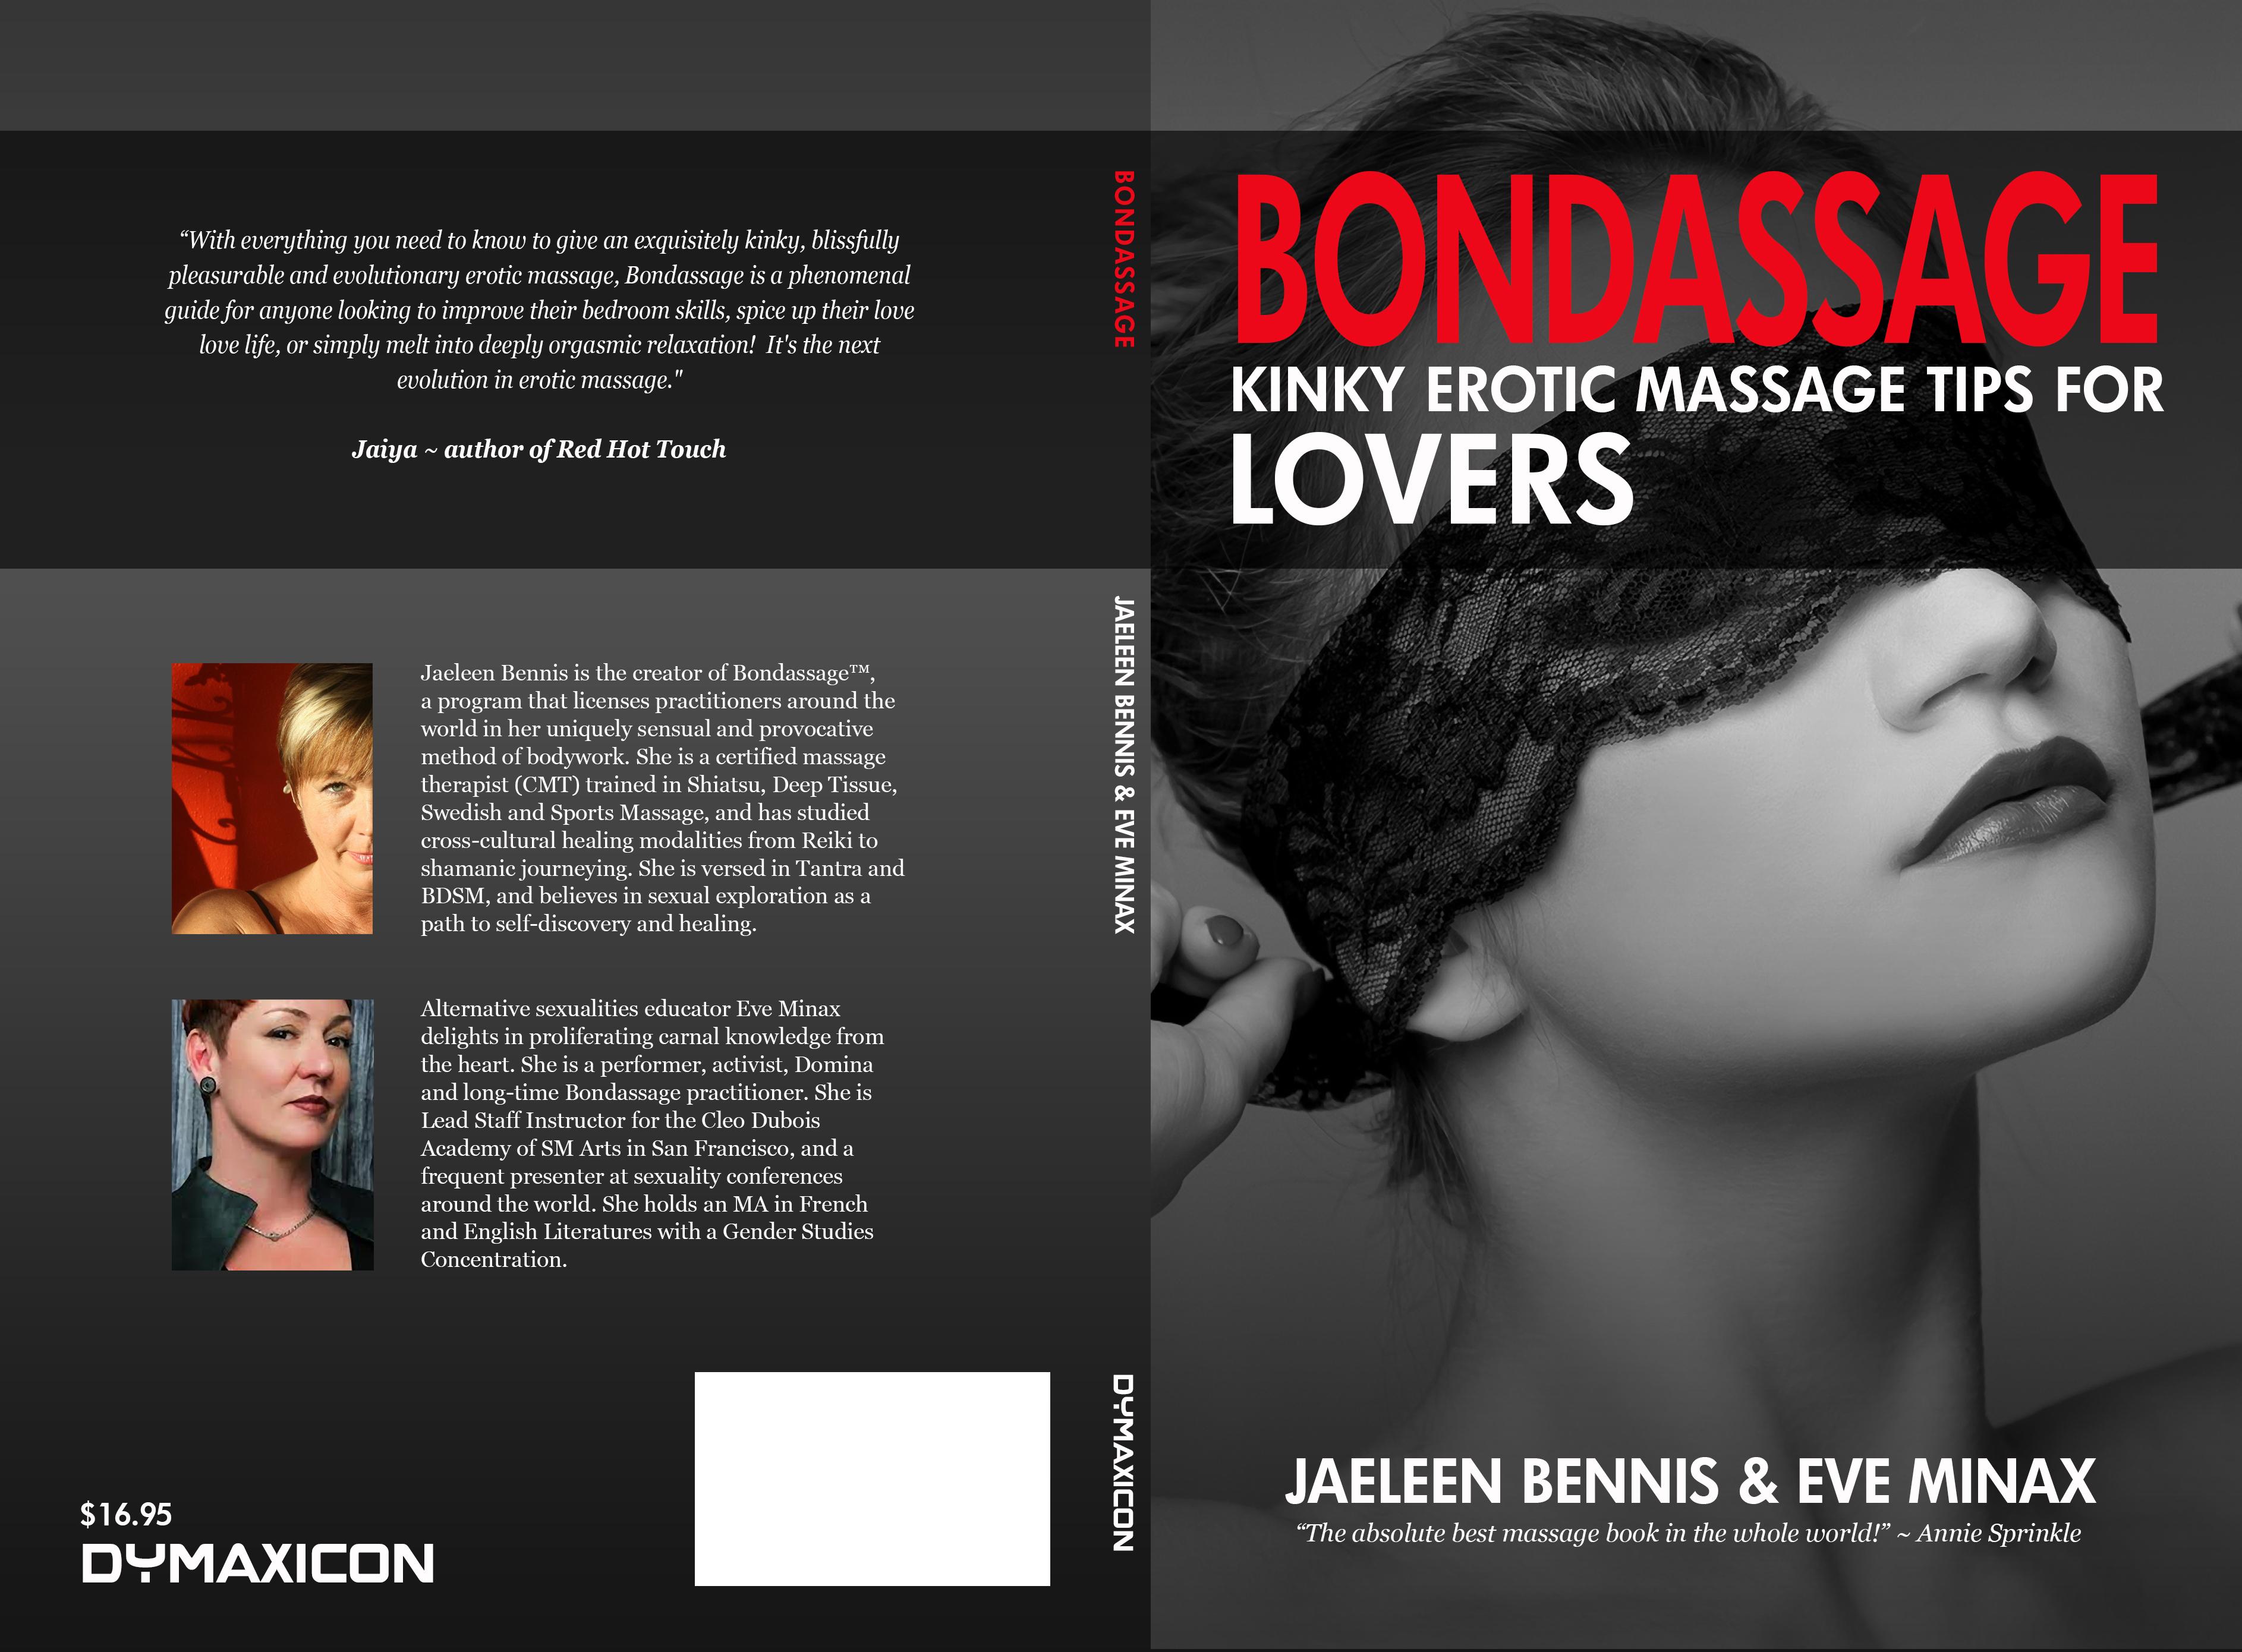 Jaeleen Creator of Bondassage